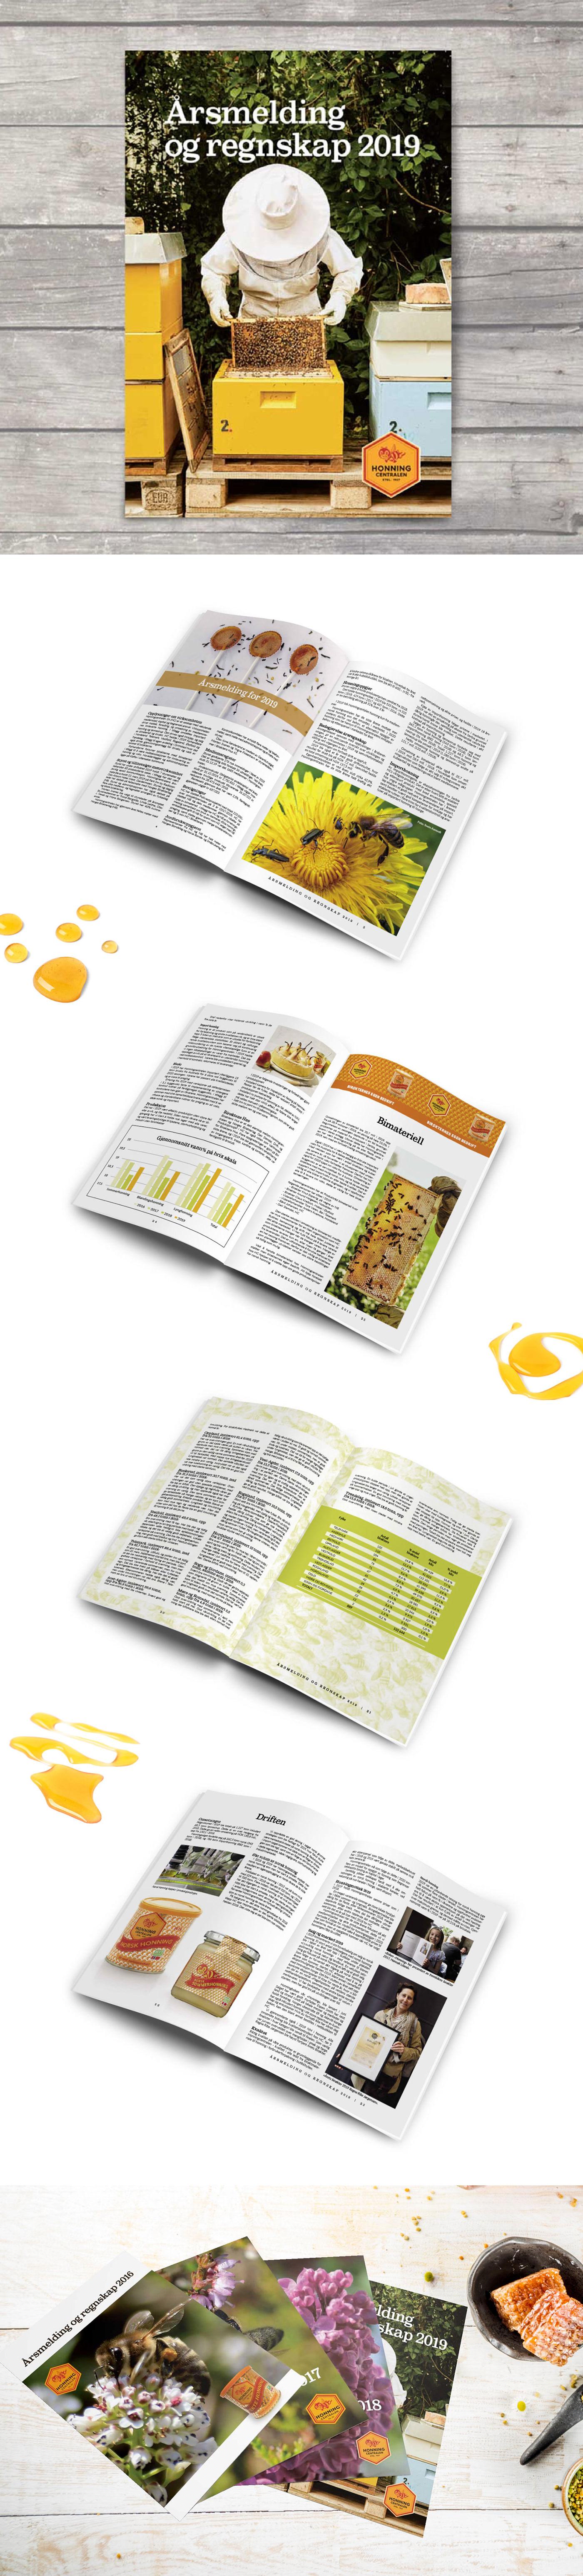 Bier bildebehandling design førtrykk honning honningcentralen Layout norway Tidsskrift trykksak